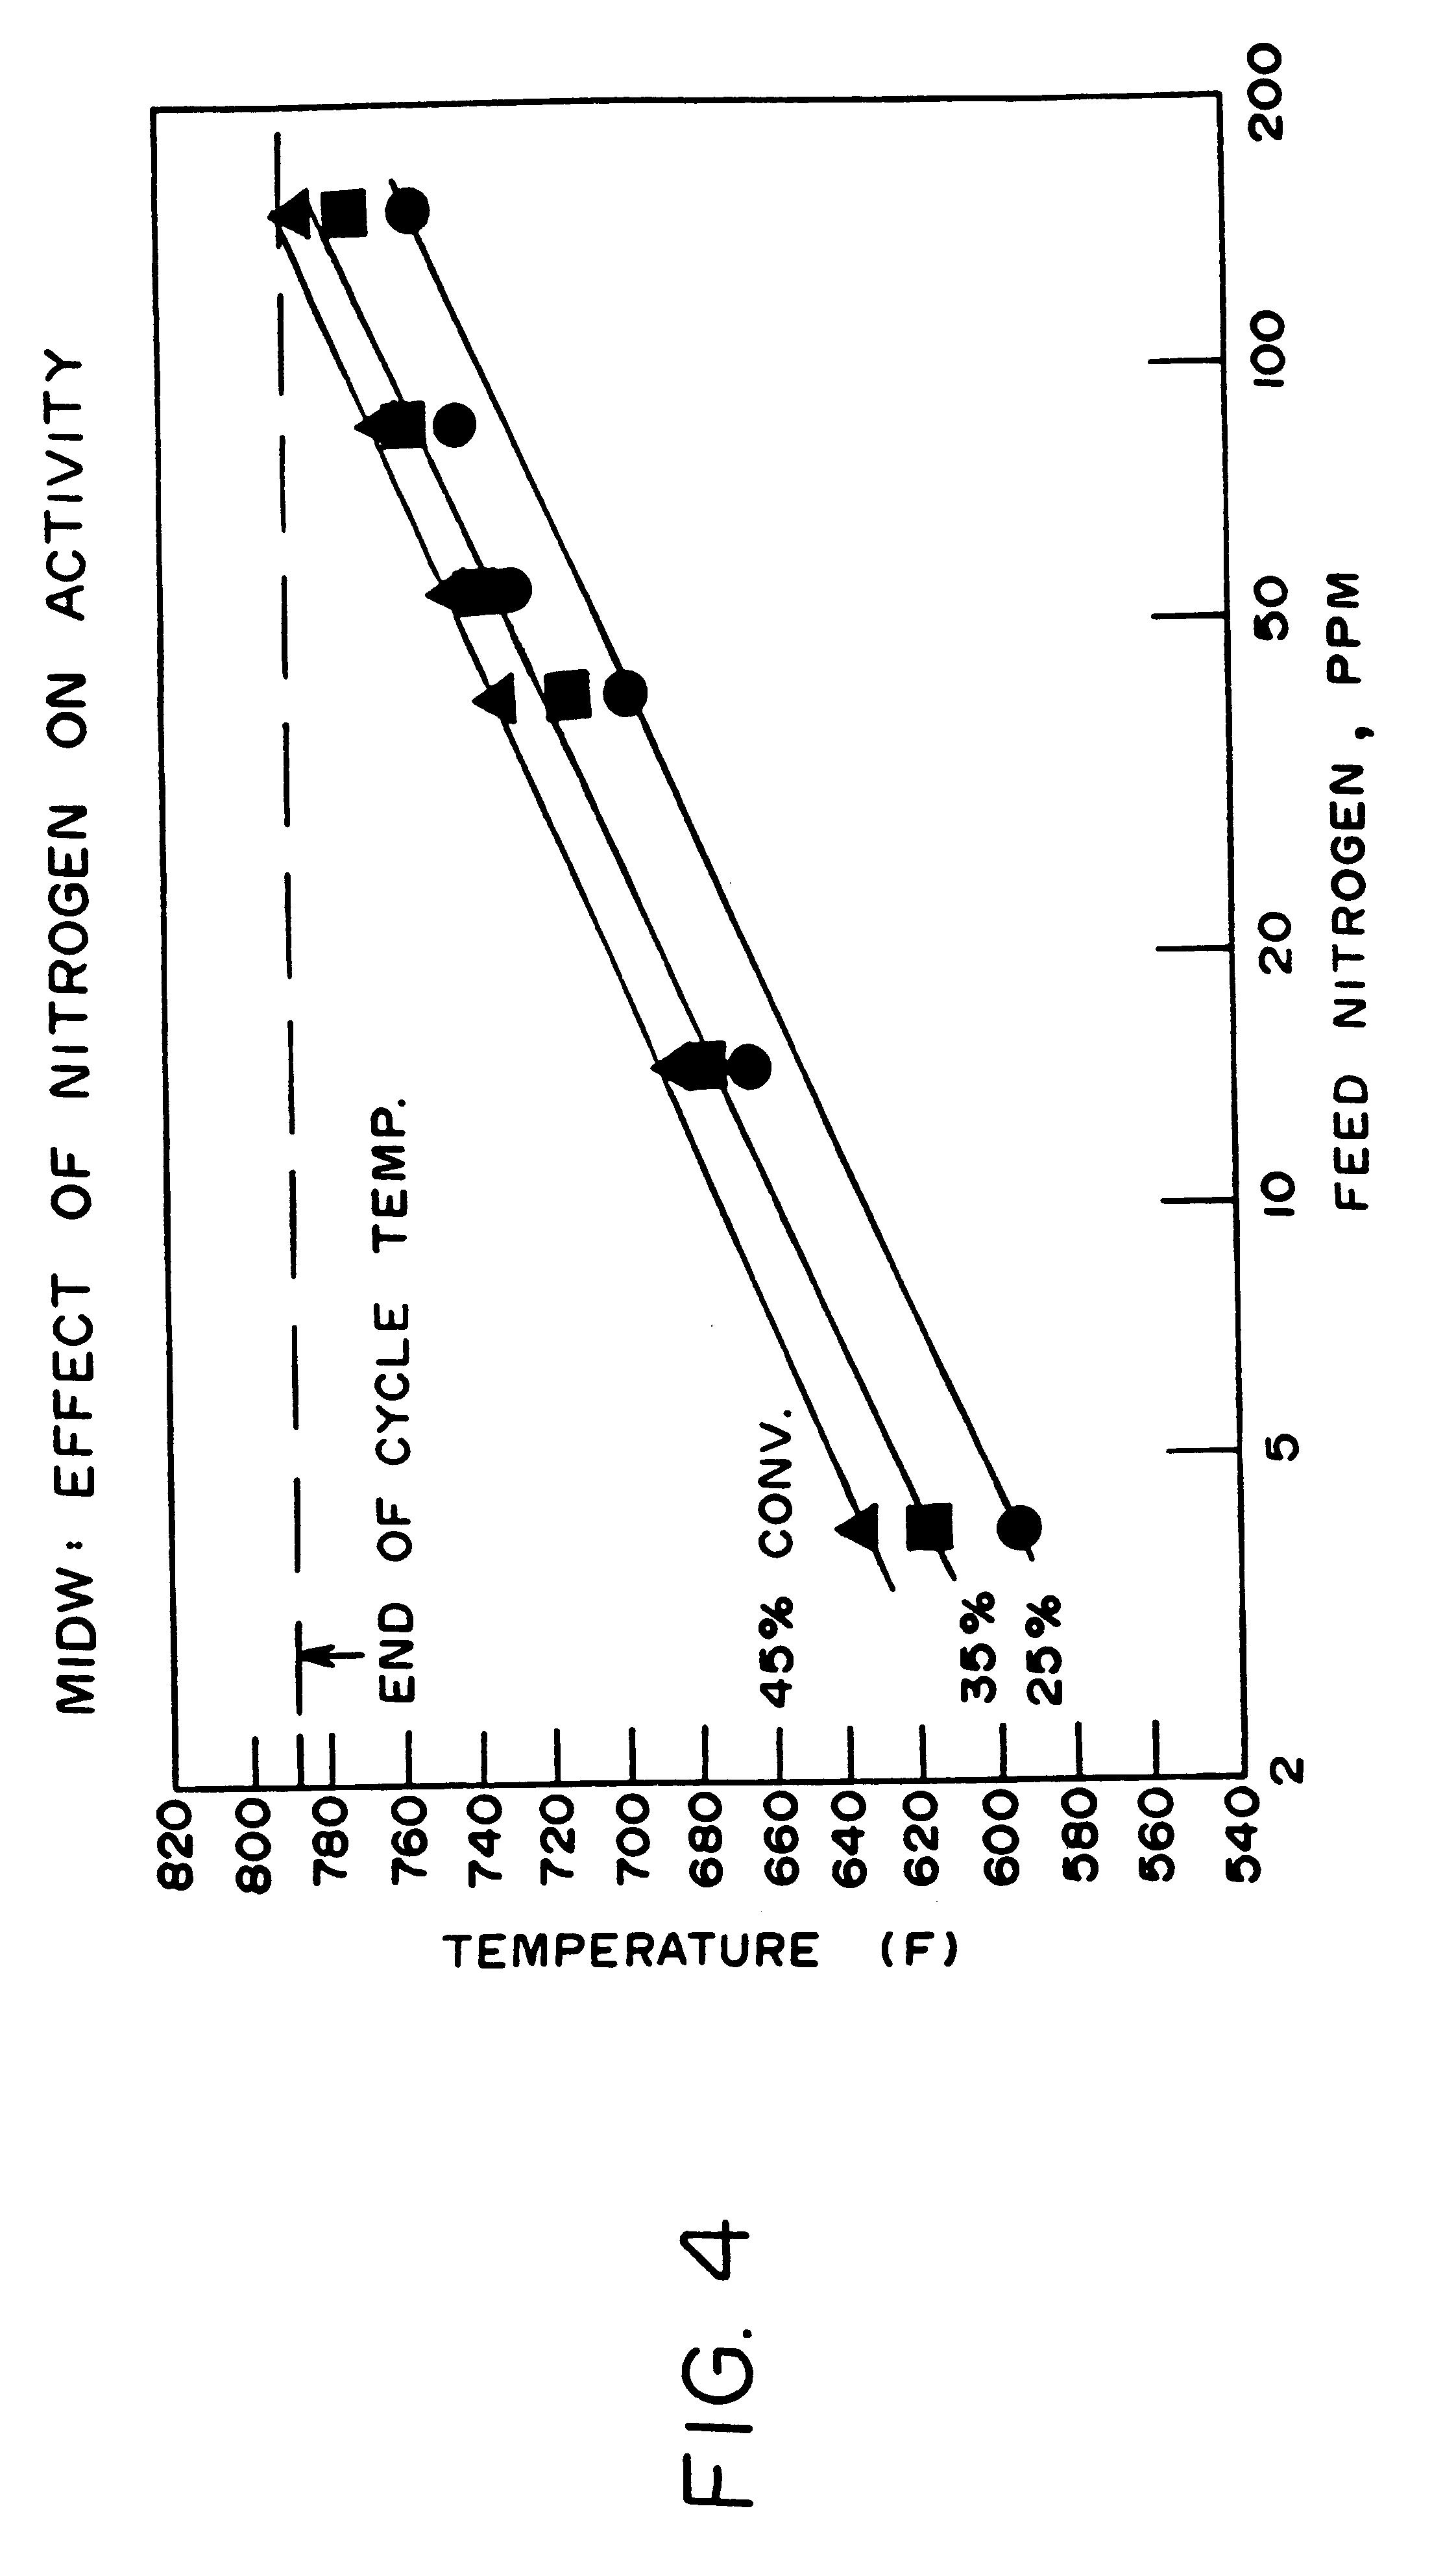 Hydrocracker reactor temperature profile in boundary